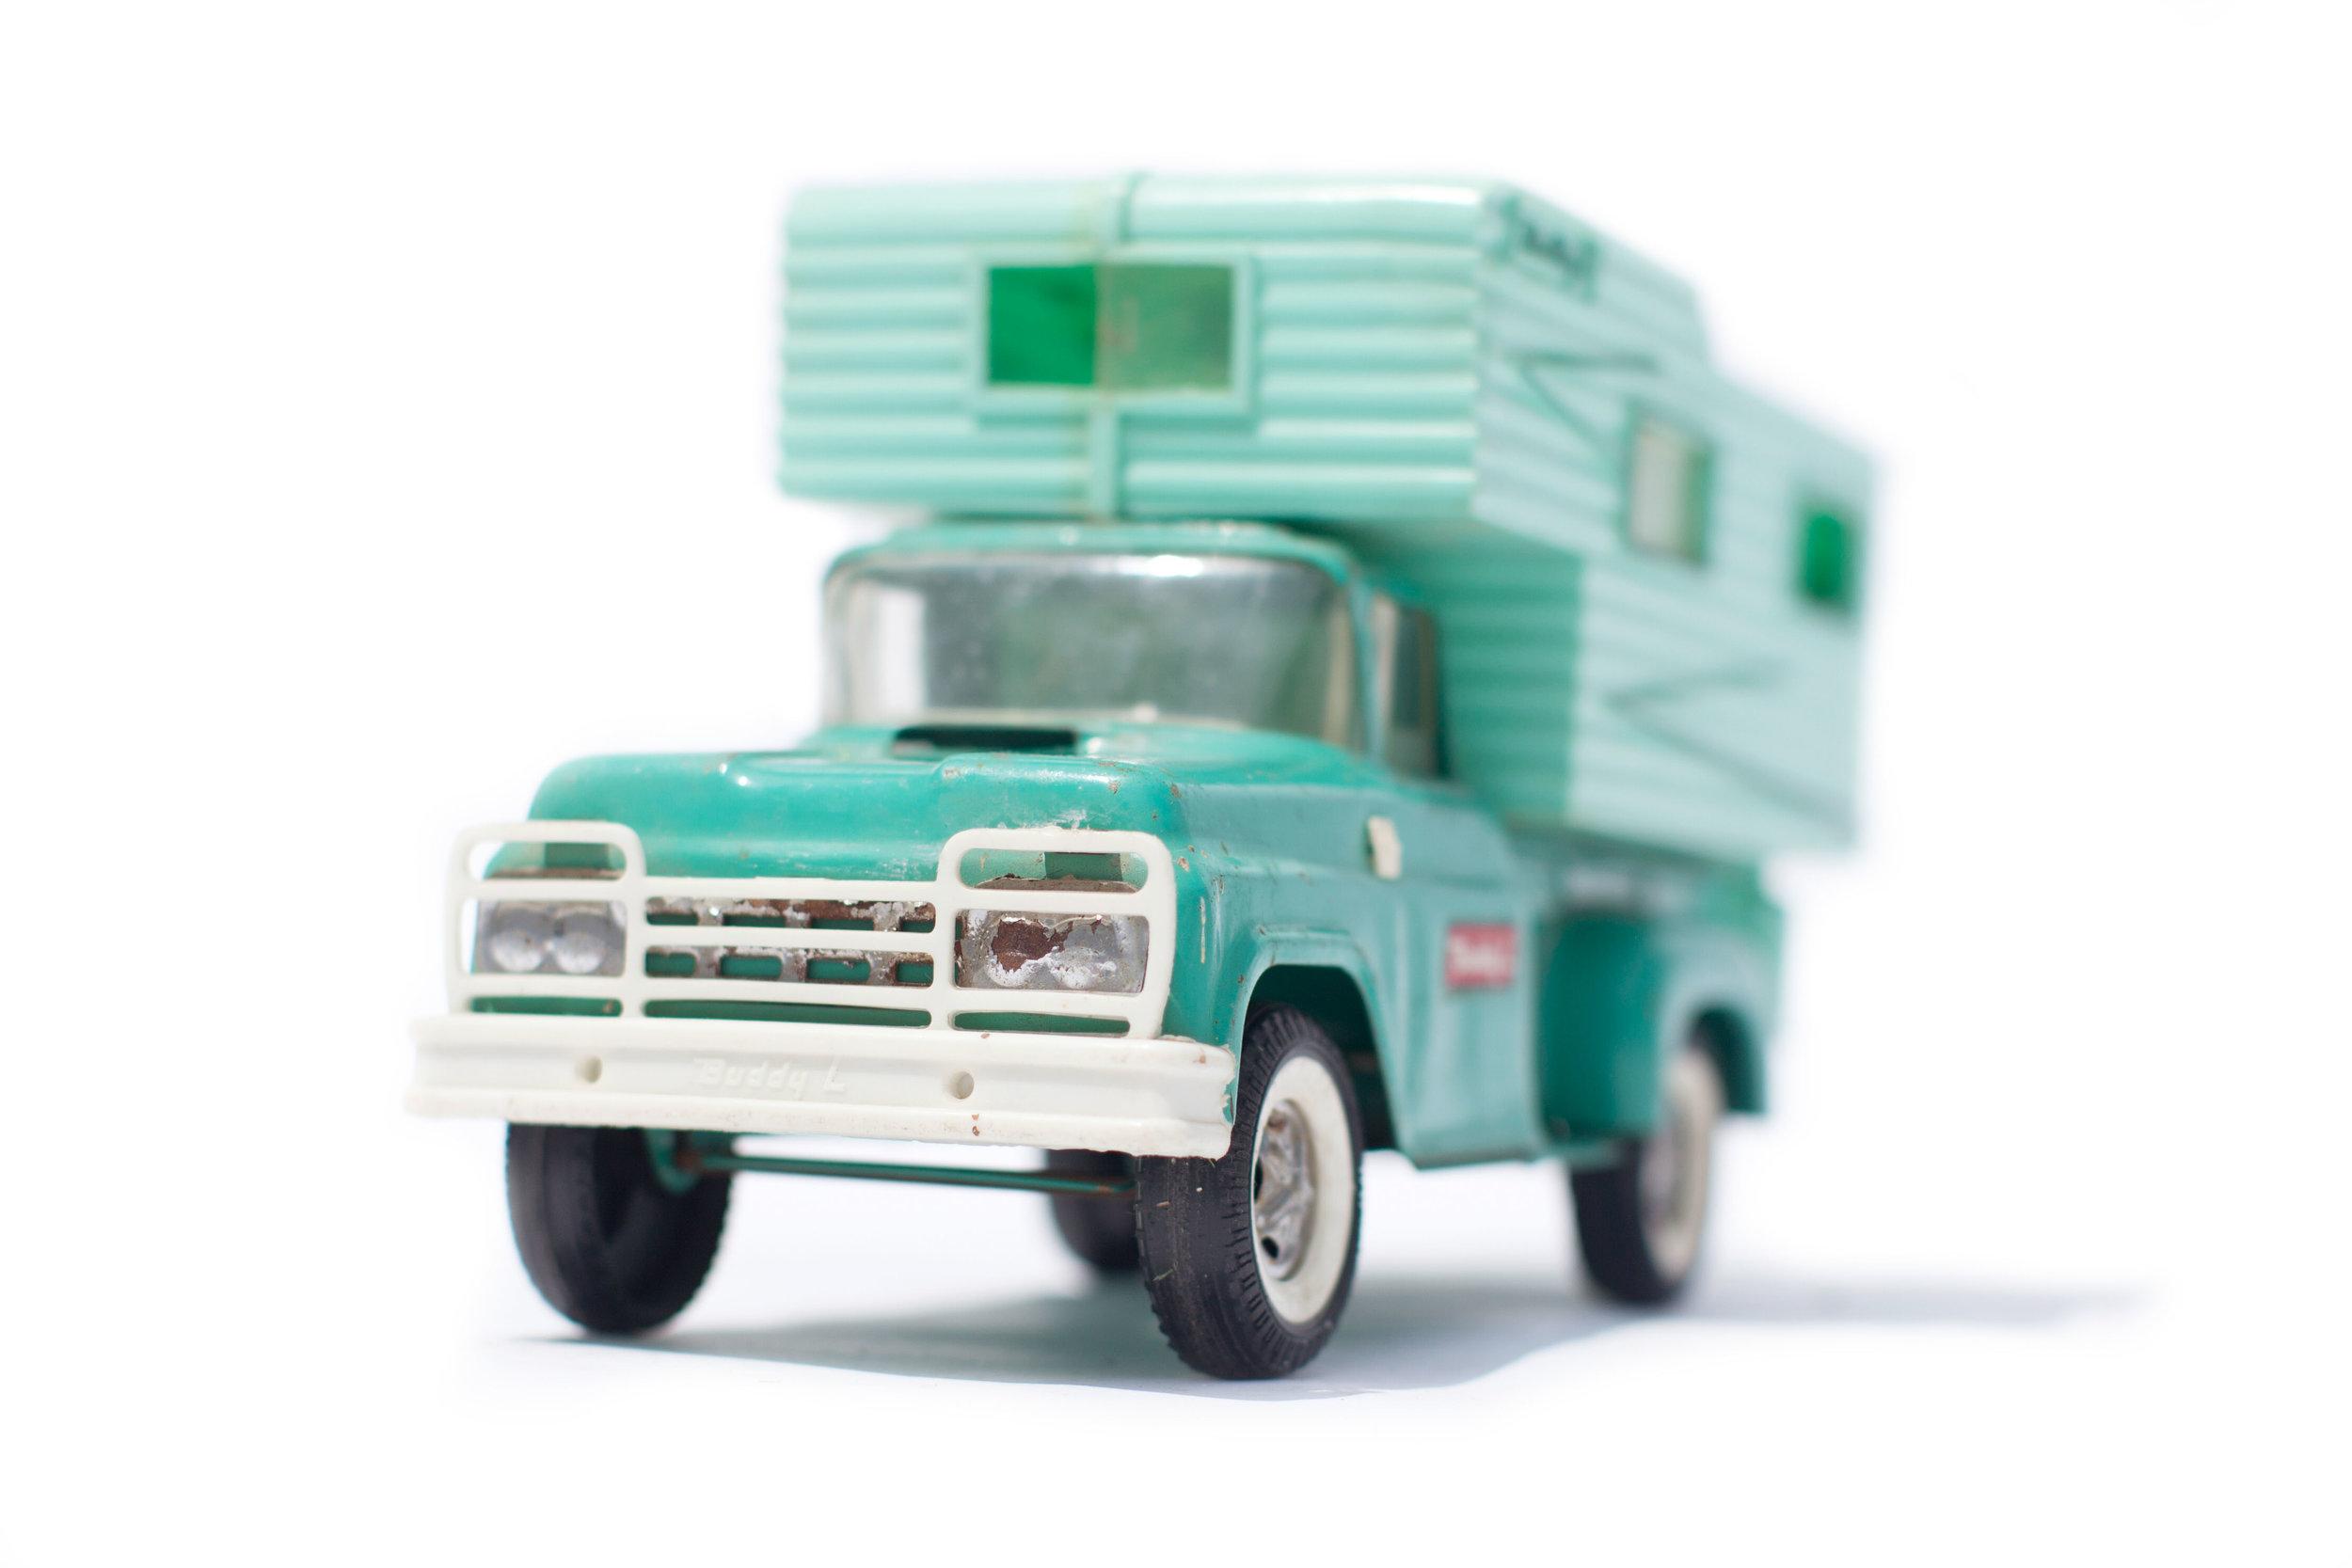 Vintage Toy Camper in Turqiois.jpg